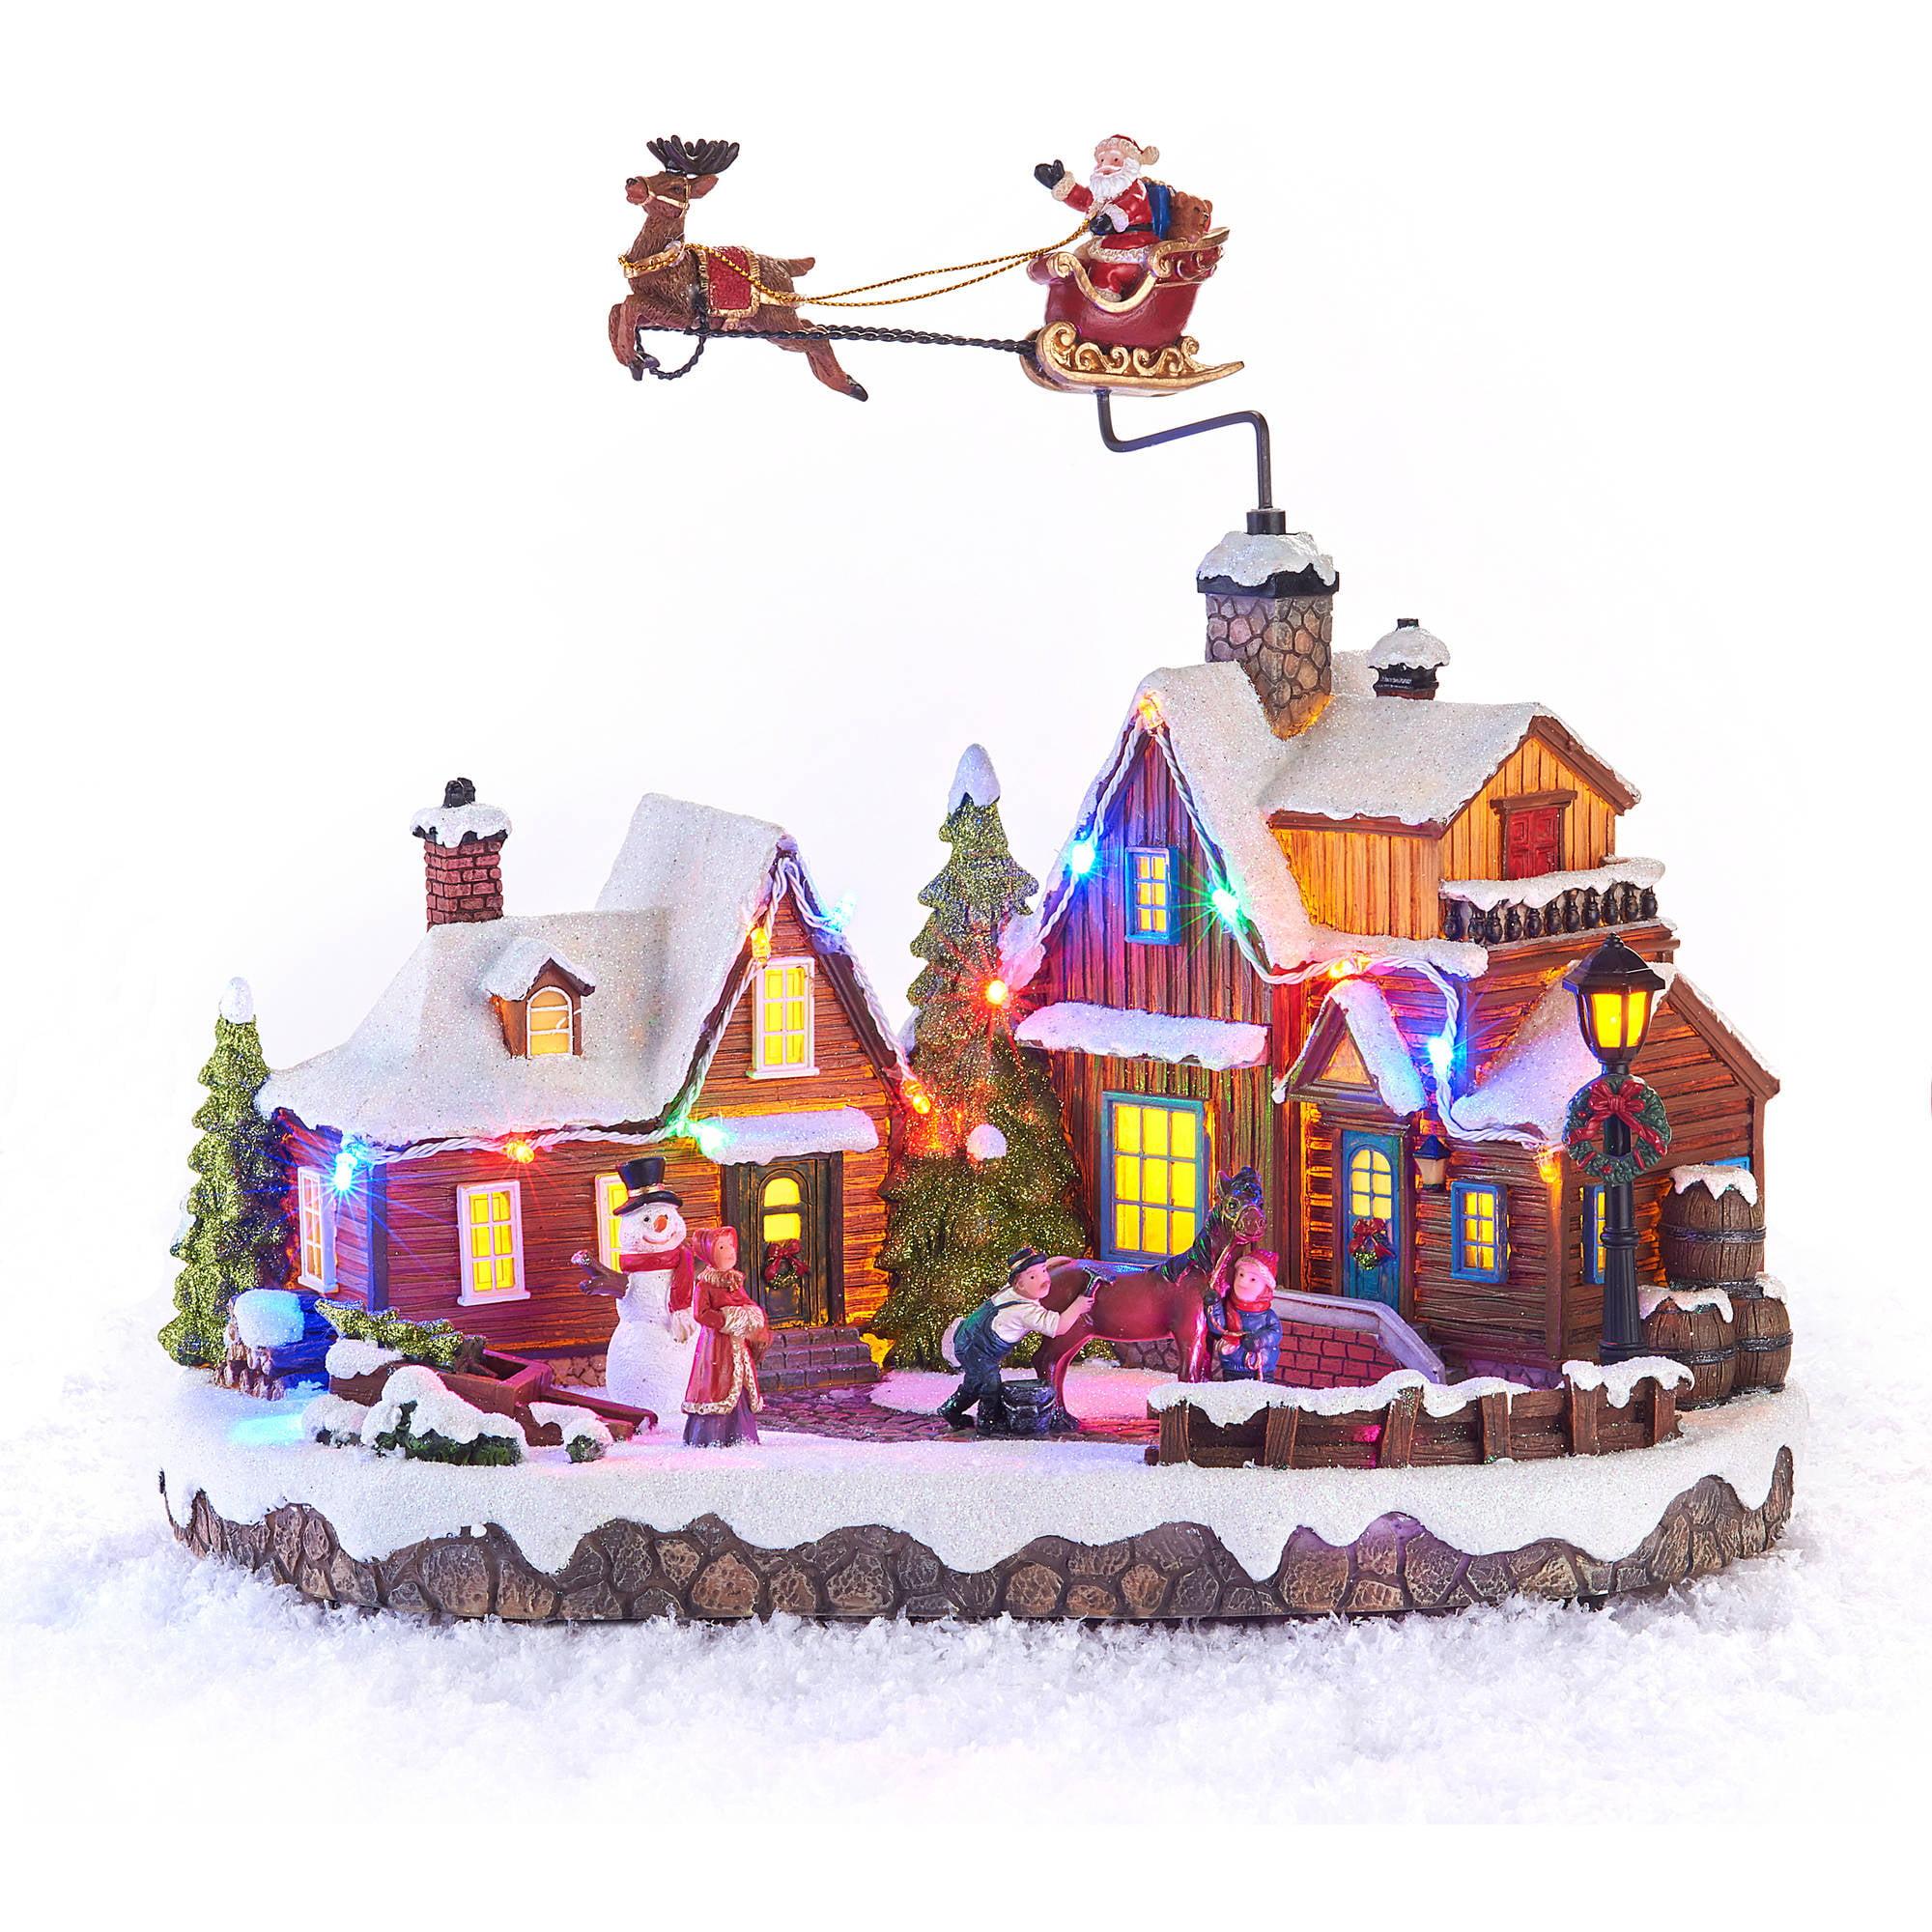 Flying santa fibre optic christmas decoration - Flying Santa Fibre Optic Christmas Decoration Flying Santa Fibre Optic Christmas Decoration Holiday Time Christmas